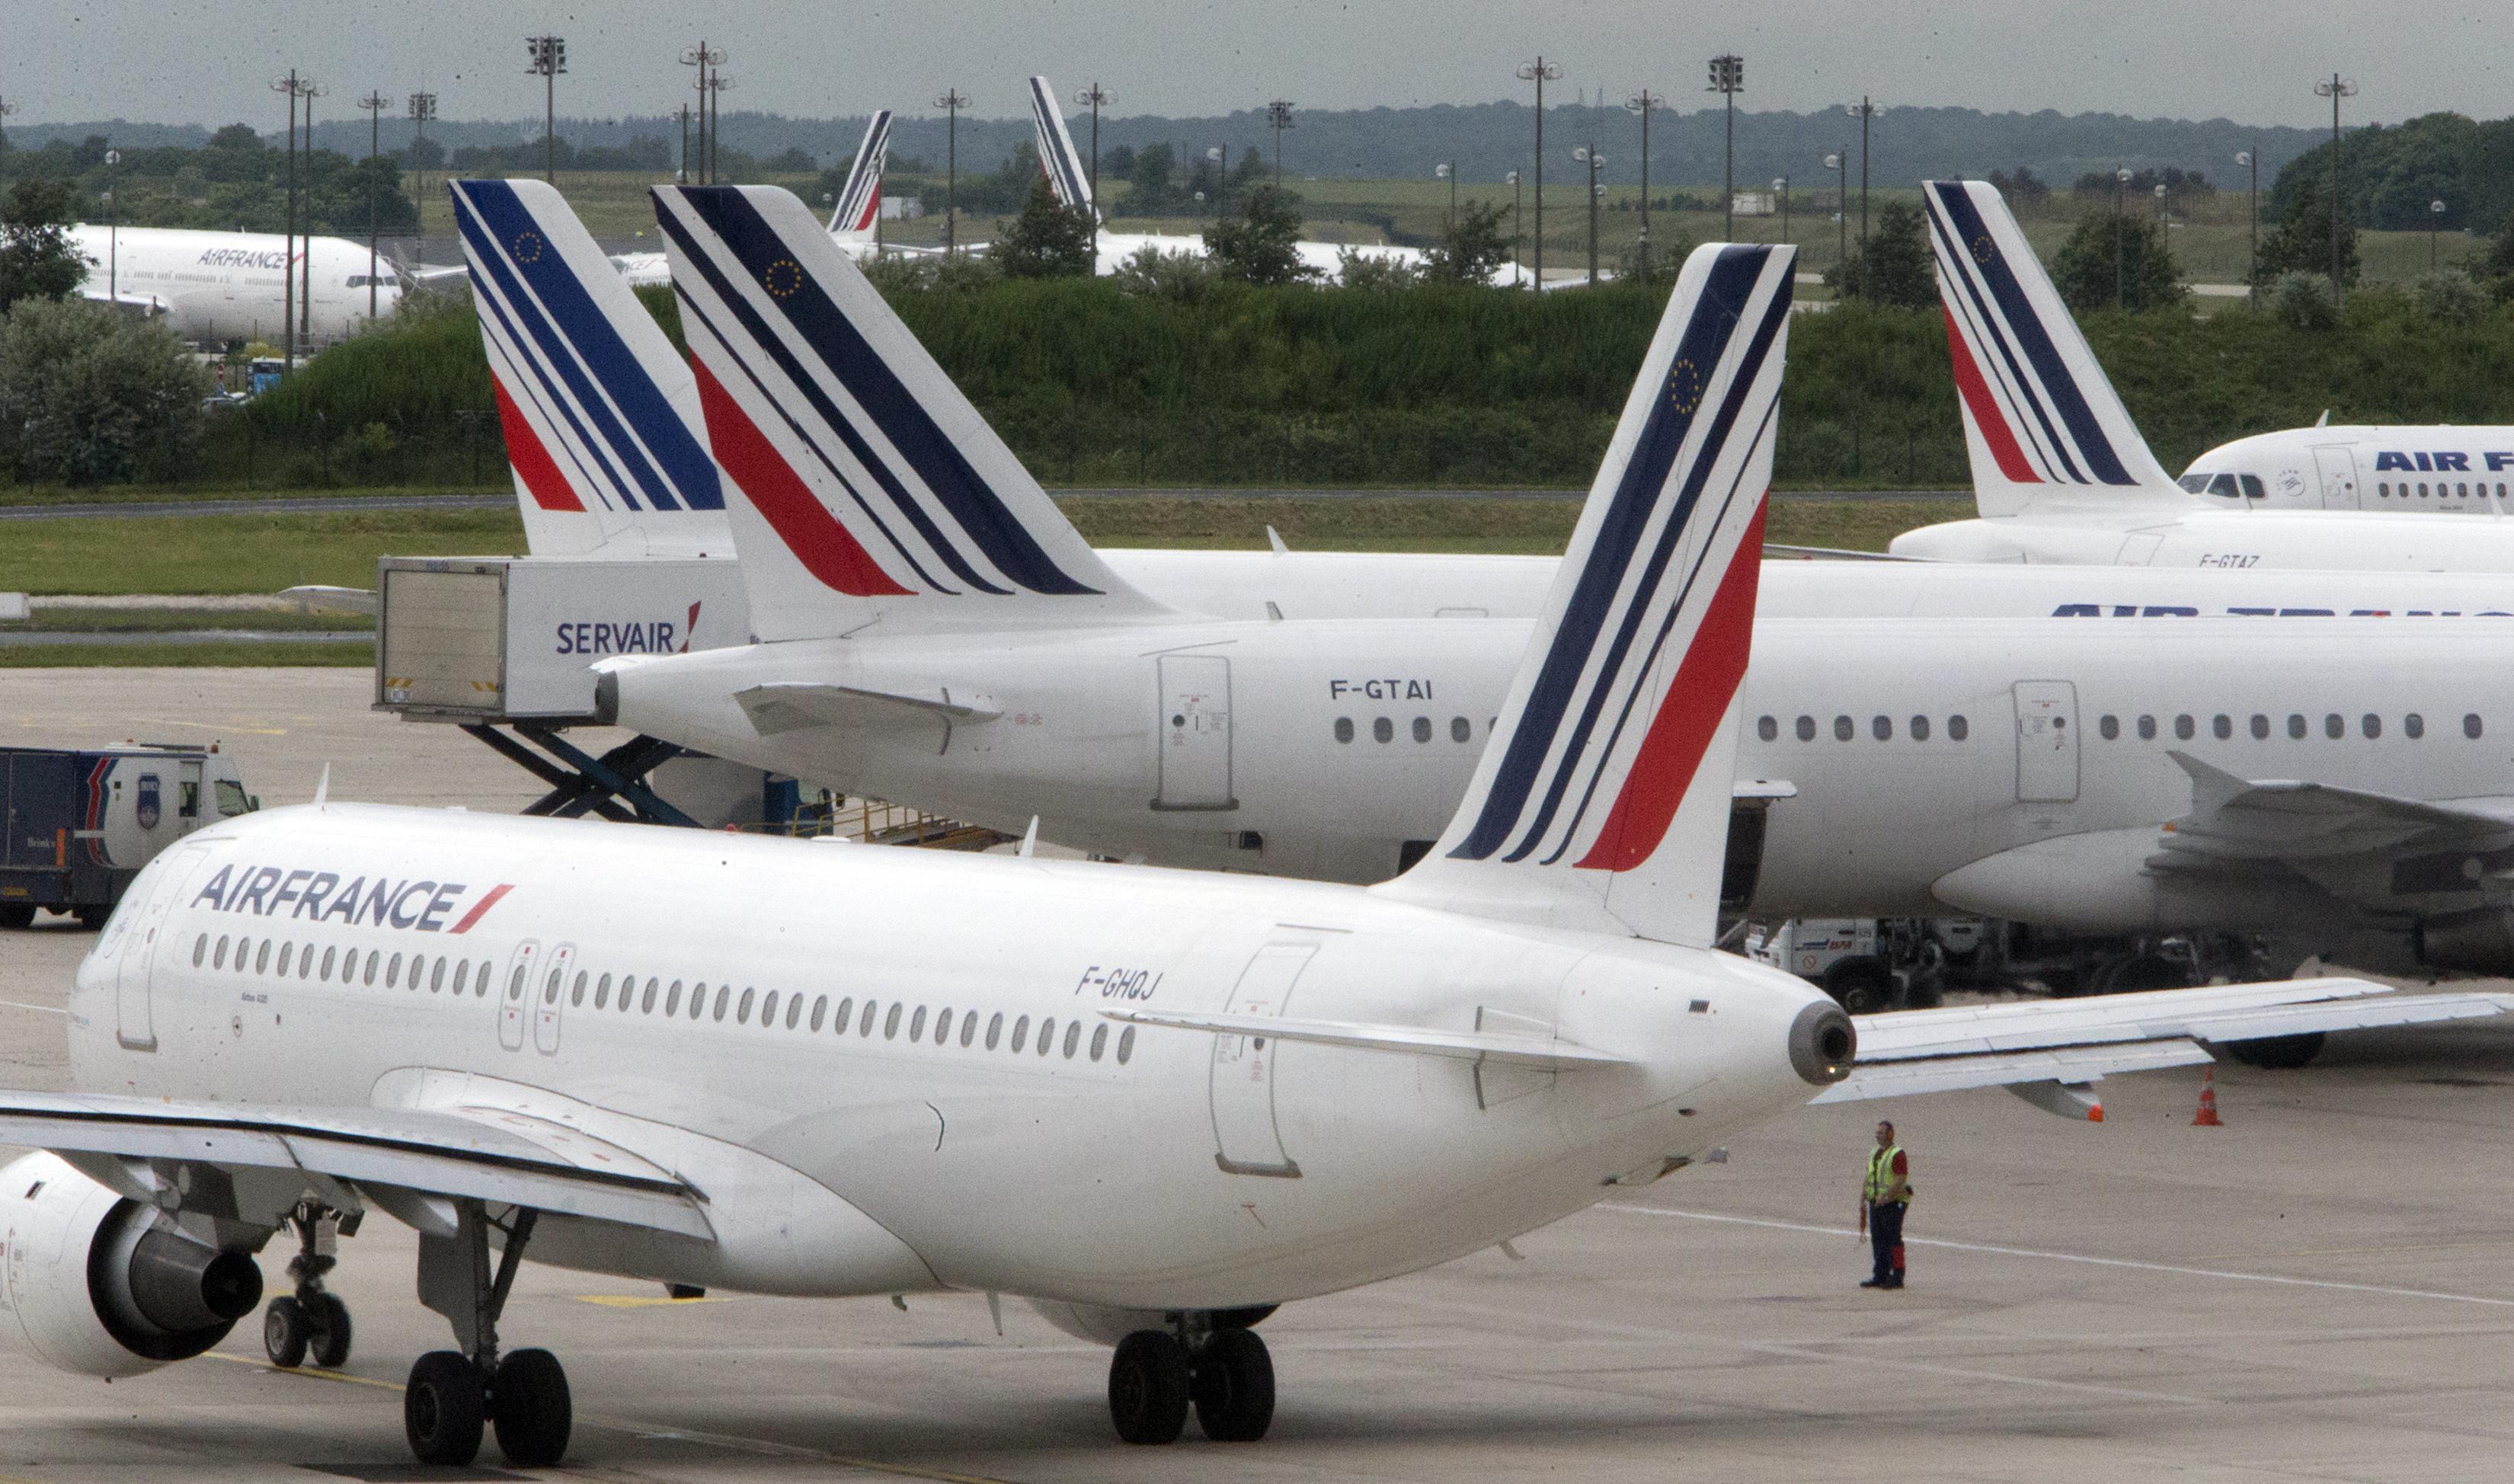 Alitalia:Air France,a ora no offerta